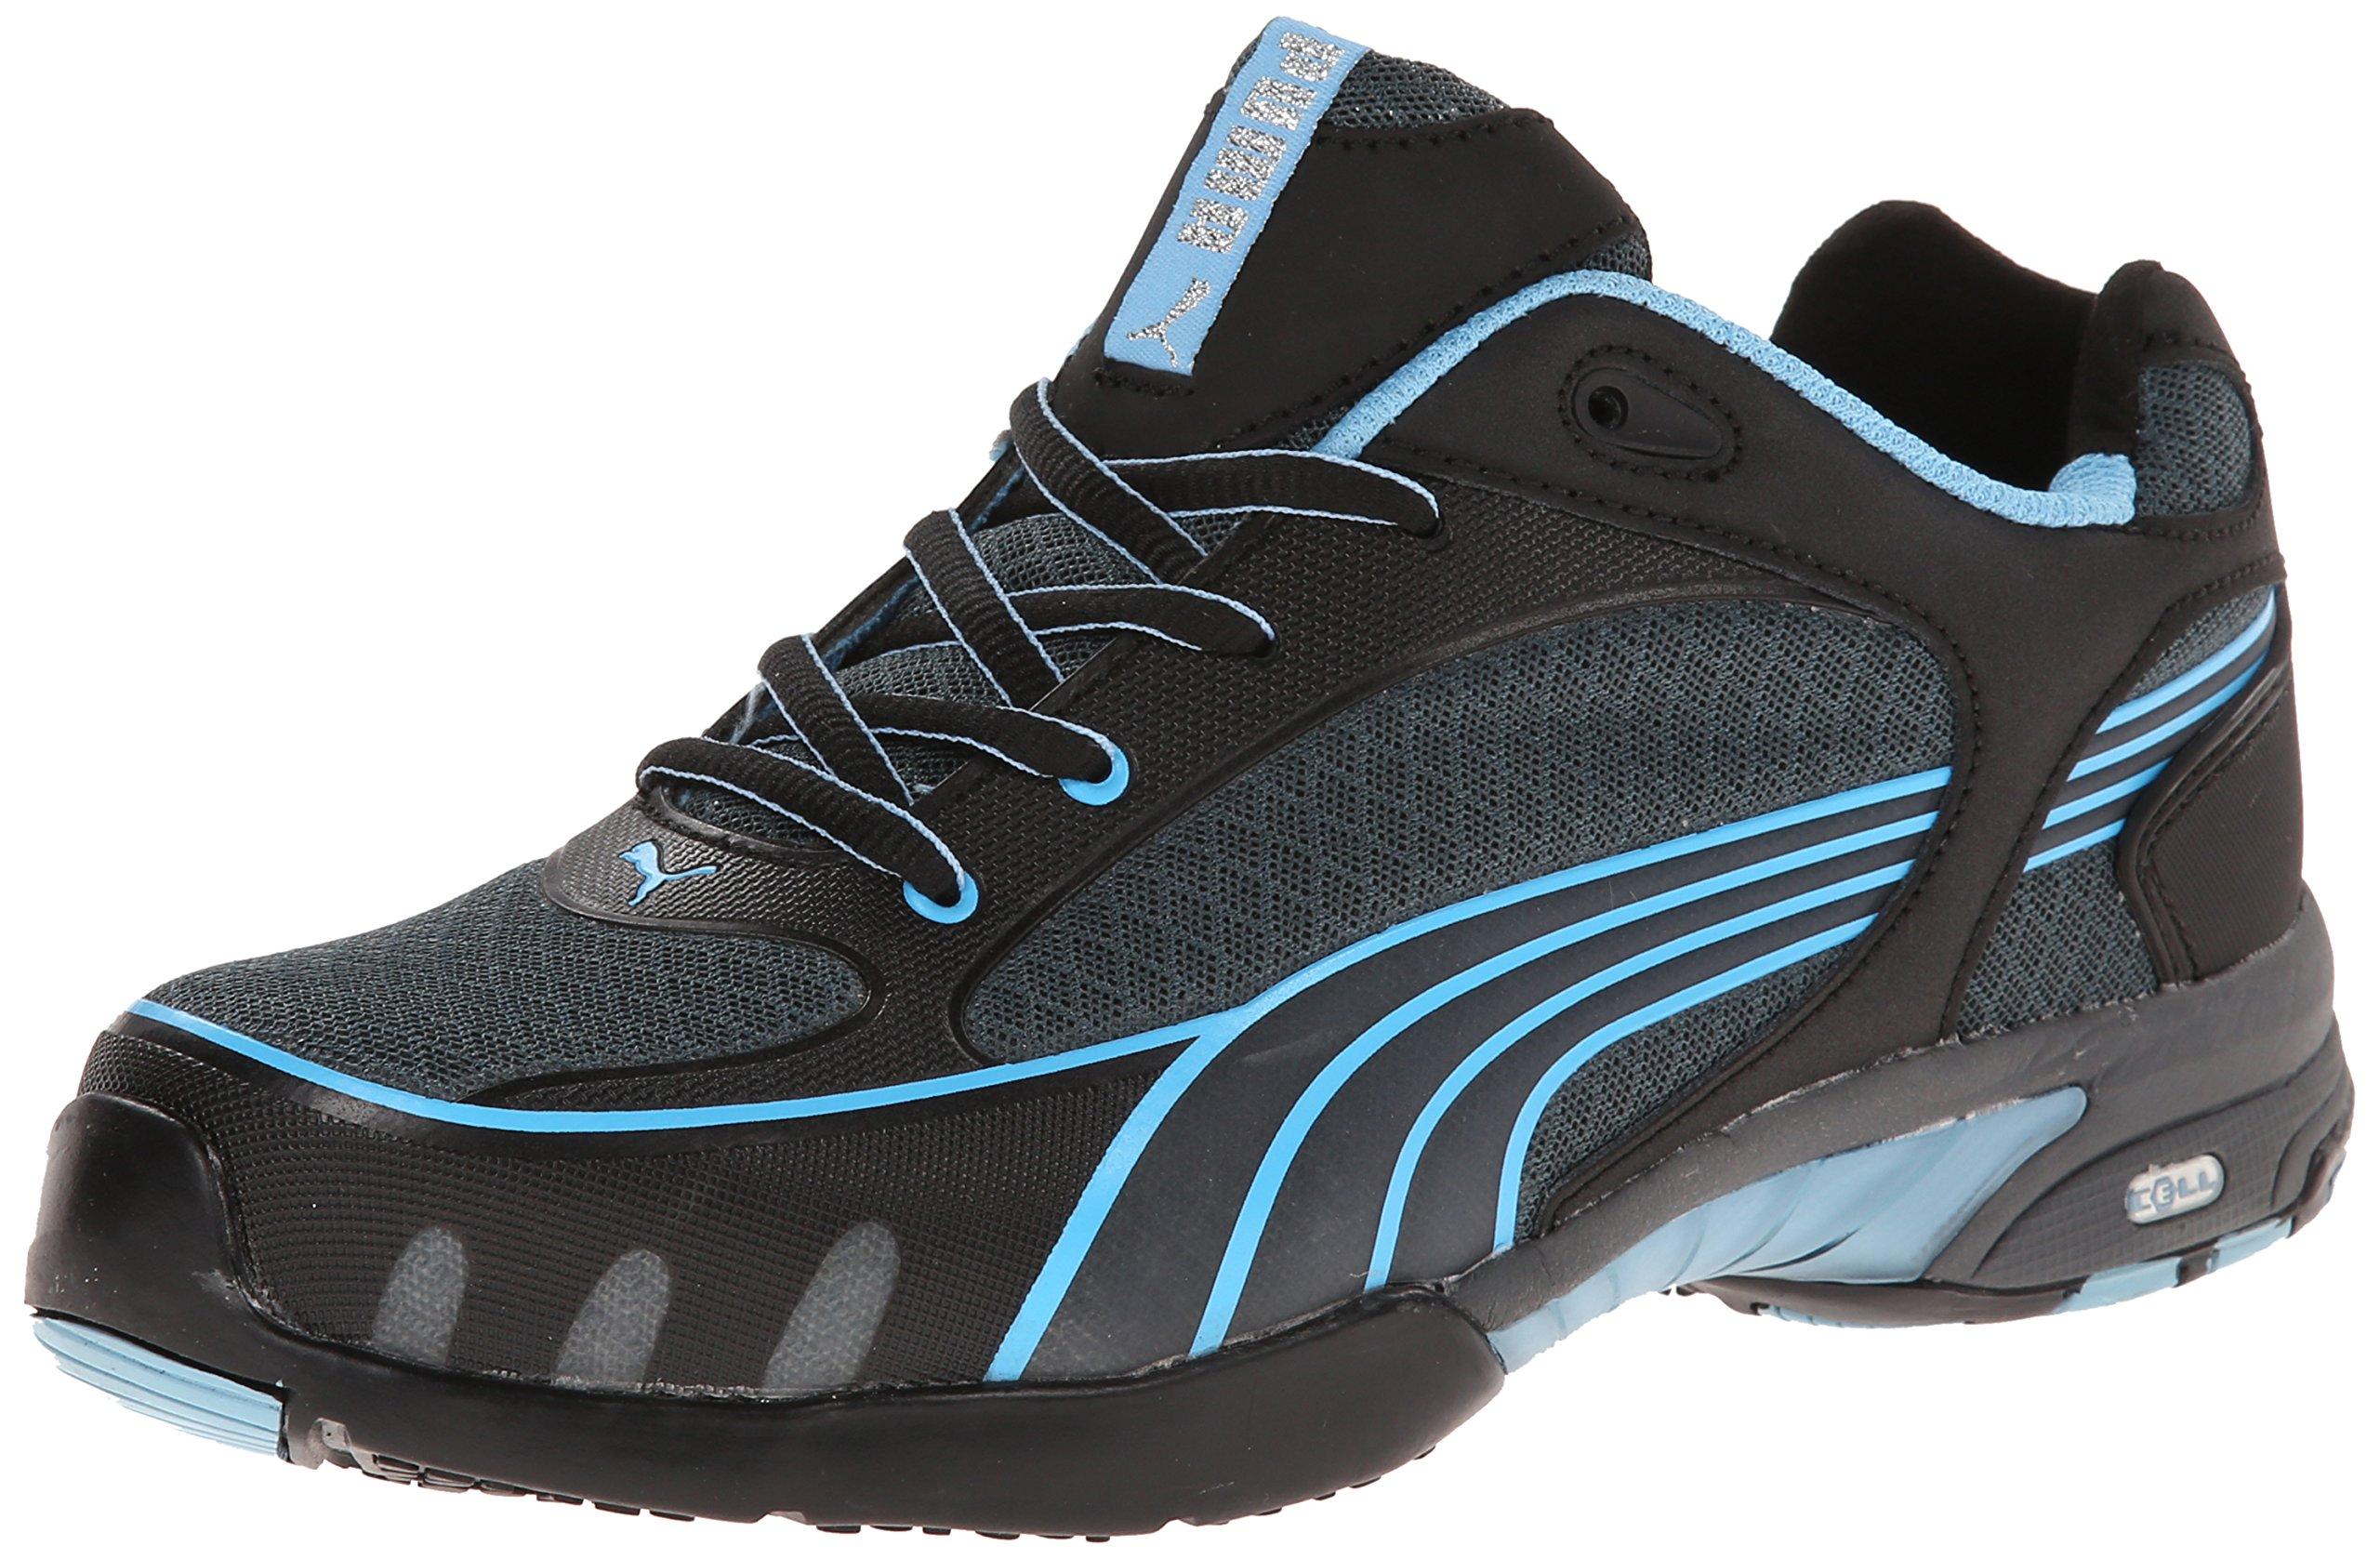 PUMA Safety Women's Fuse Motion SD Black/Blue Sneaker 7 W